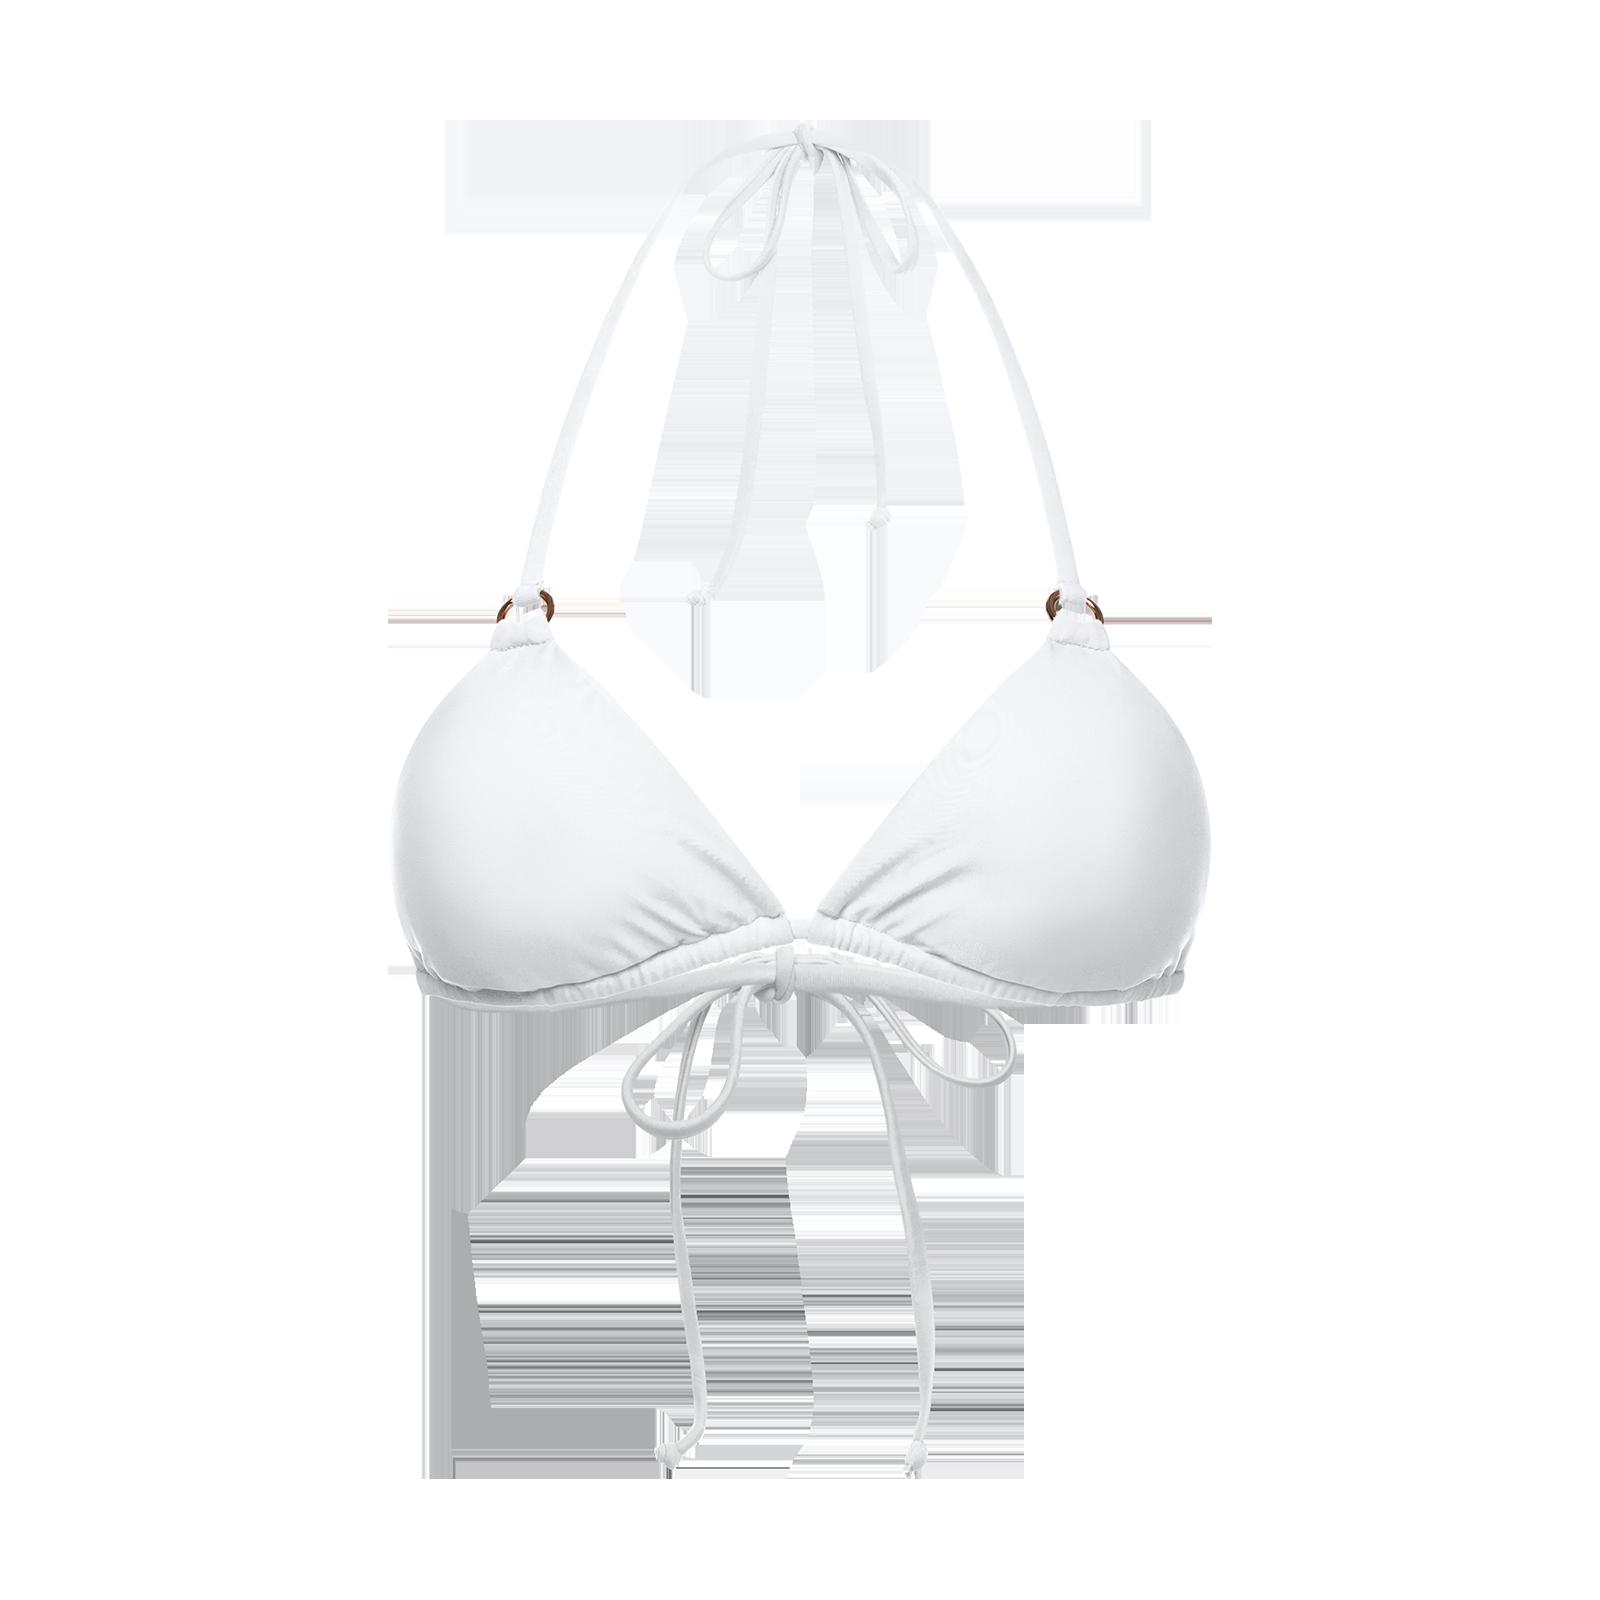 Swimsuit bra product photo